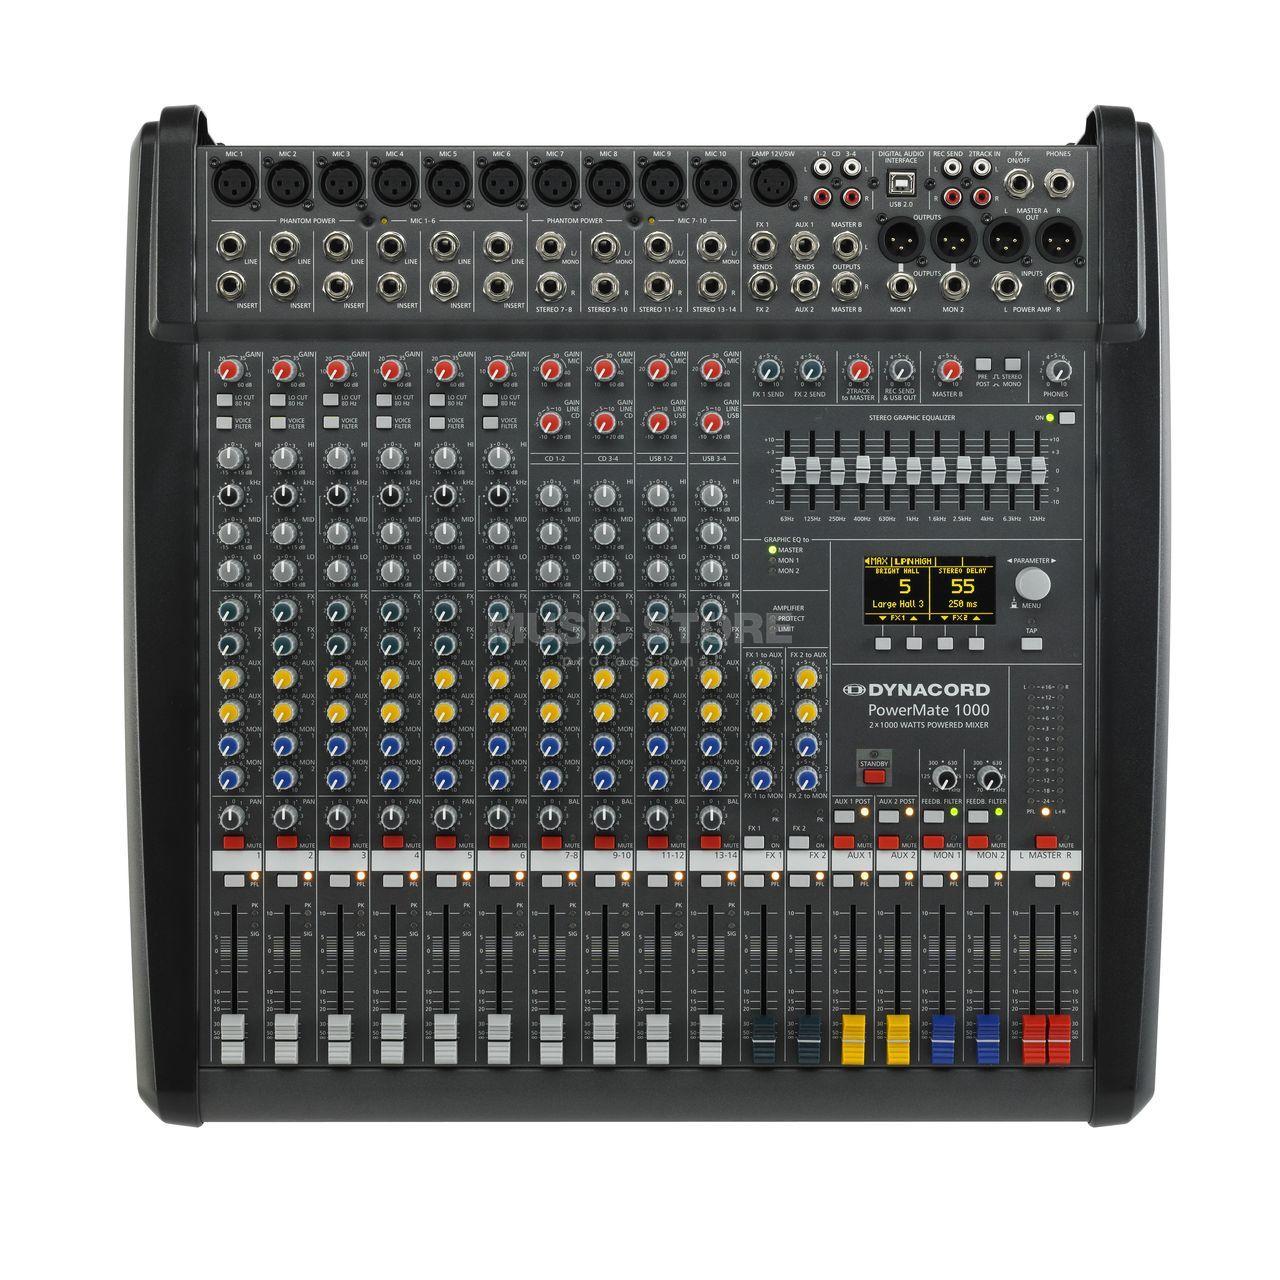 Dynacord powermate 1000 3 table de mixage amplifi e 2x 1000 w 4 ohms - Table de mixage dynacord occasion ...